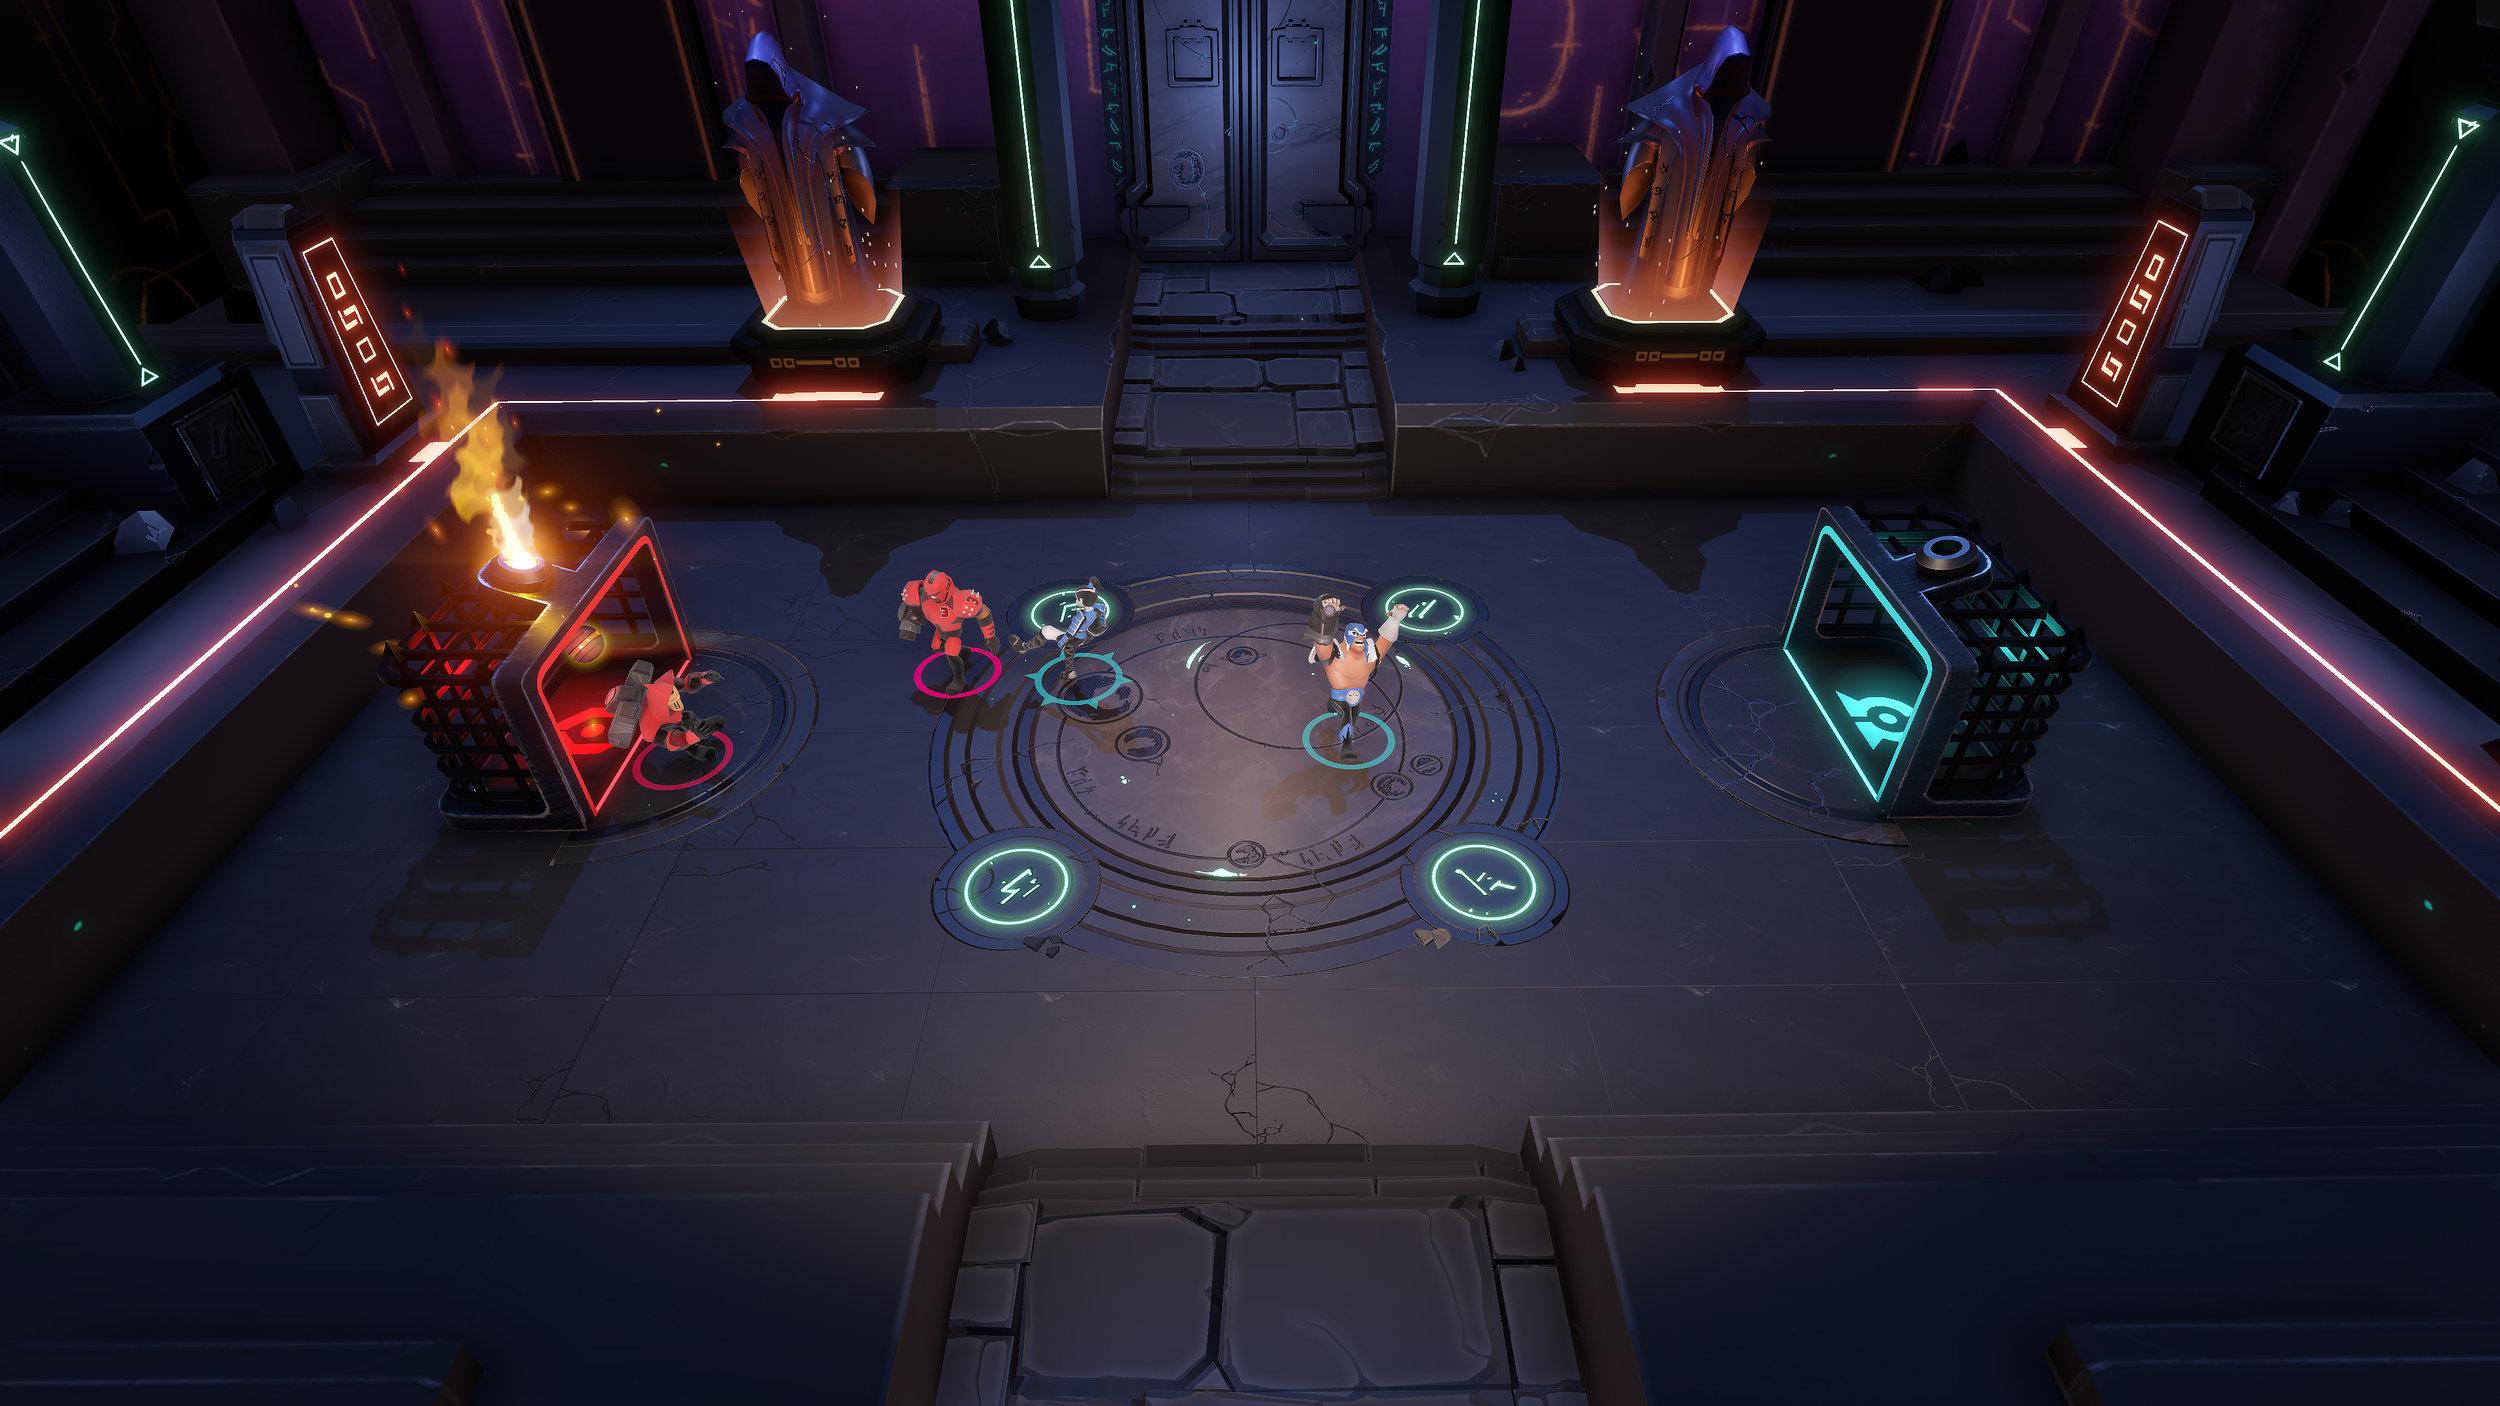 gameplay_temple_4k.jpg